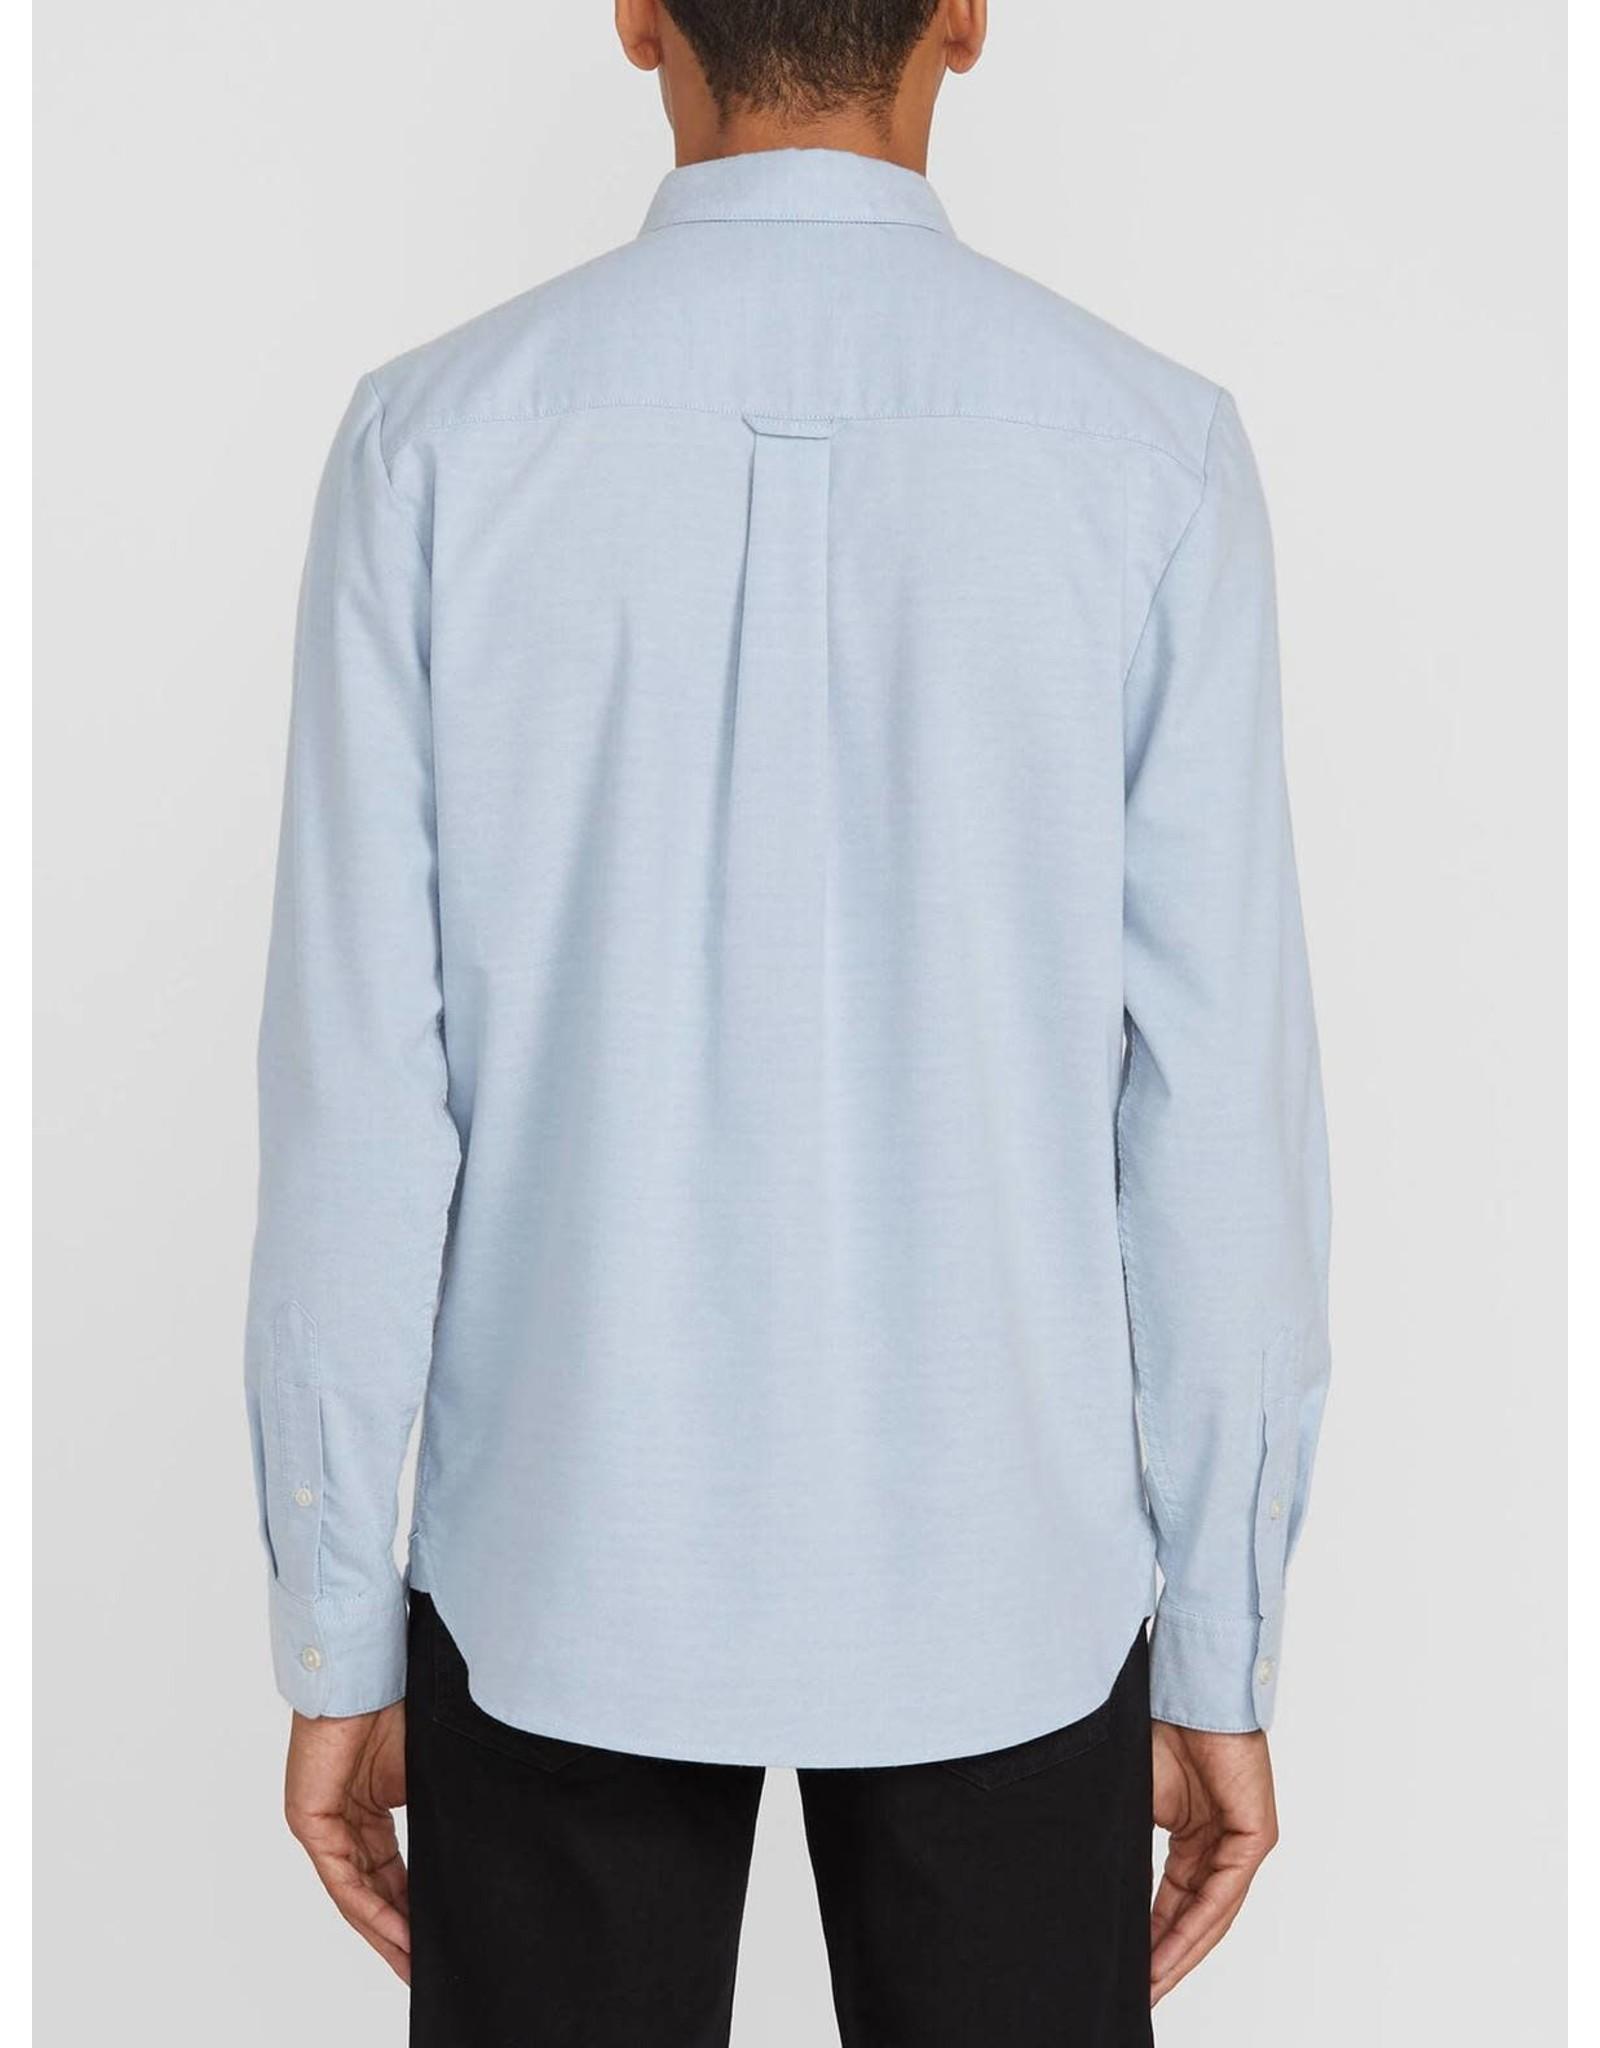 volcom Volcom - chemise oxford stretch wrecked indigo